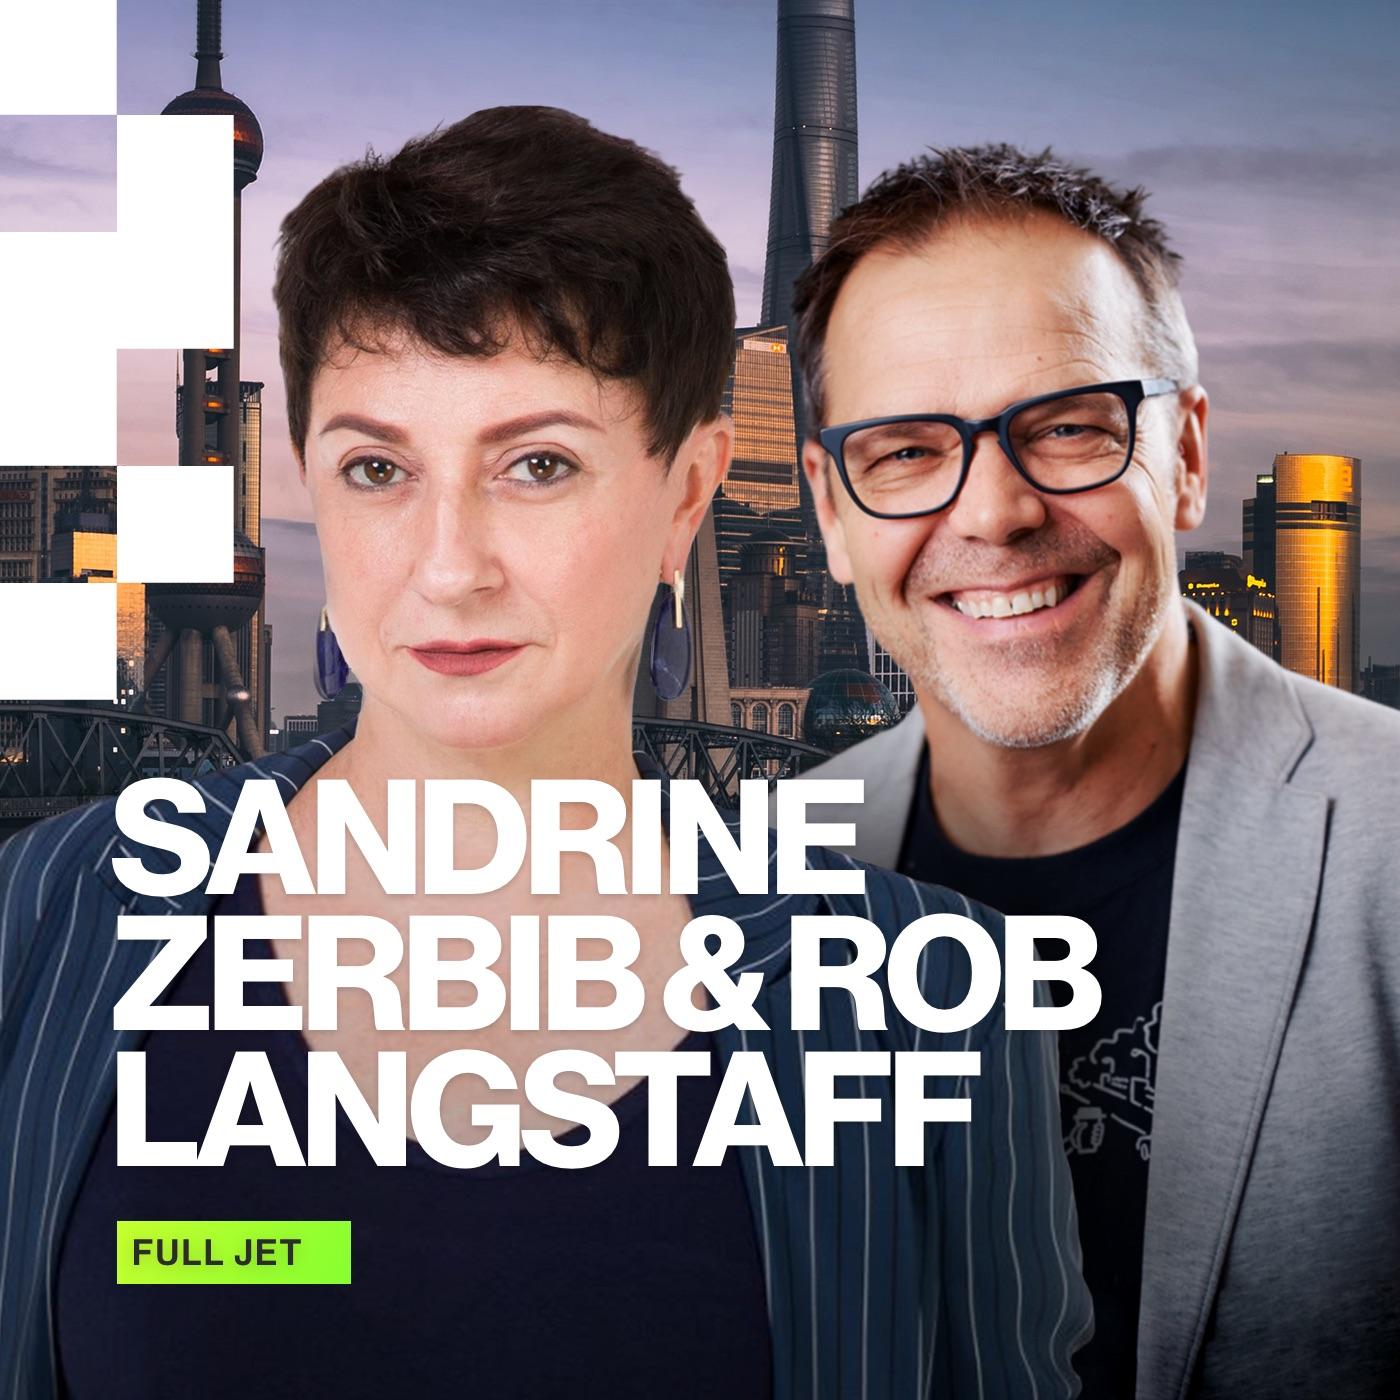 Sandrine Zerbib and Rob Langstaff